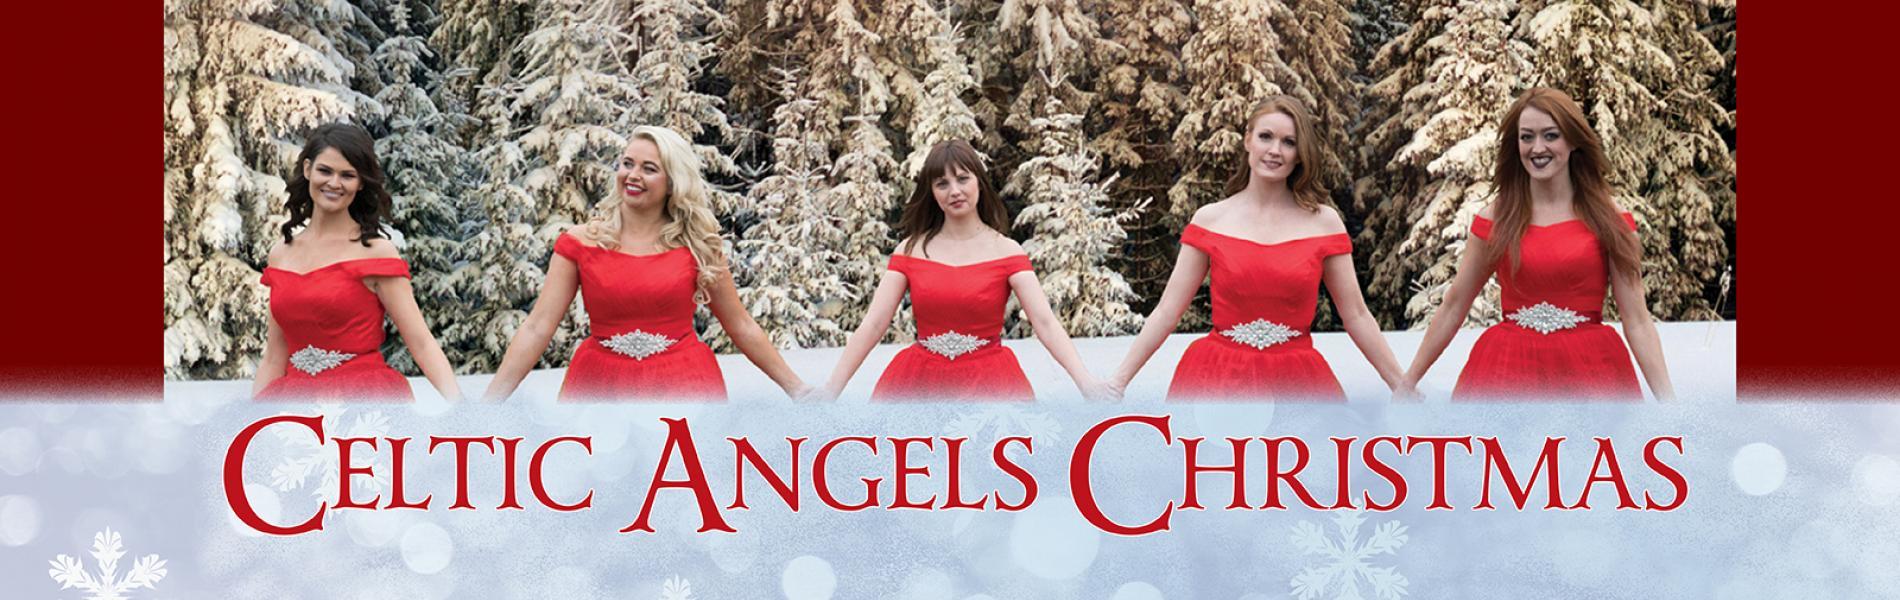 Celtic Angels Christmas